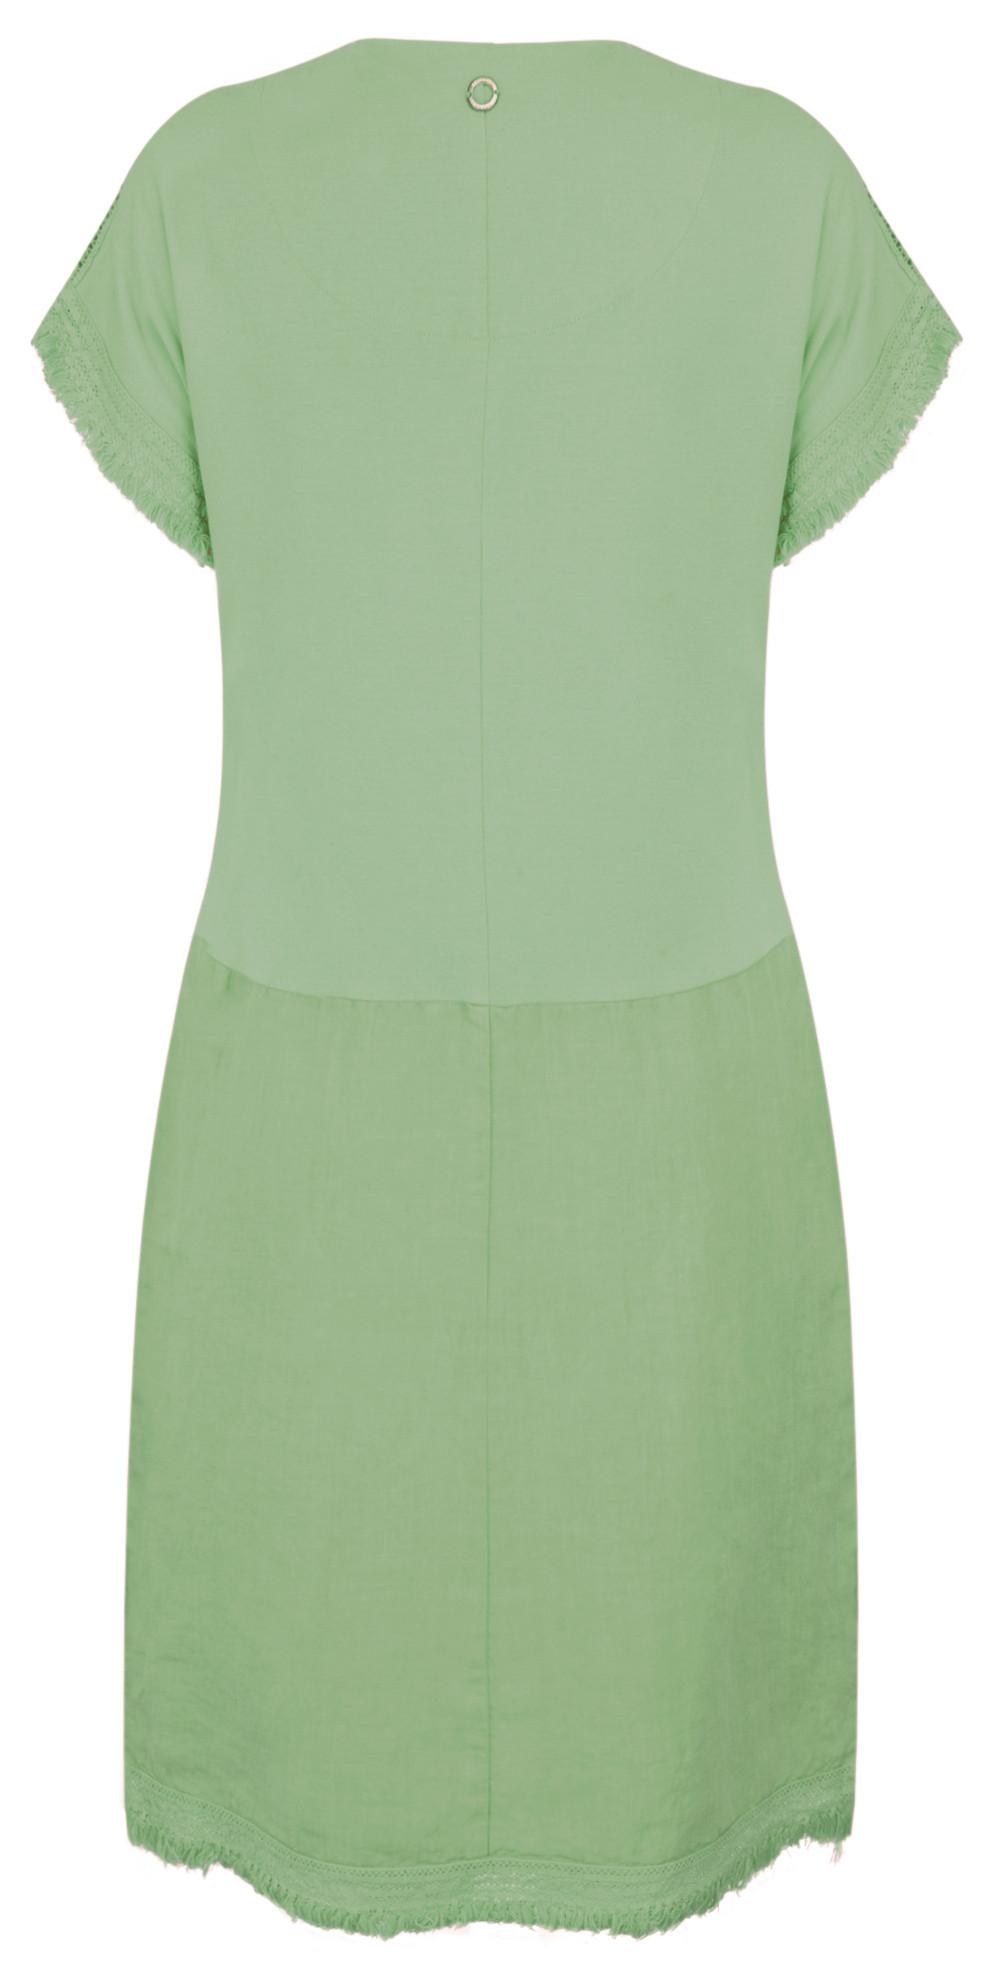 9d40e25f1fe9 Sandwich Clothing Summer Linen Dress in Hedge Green